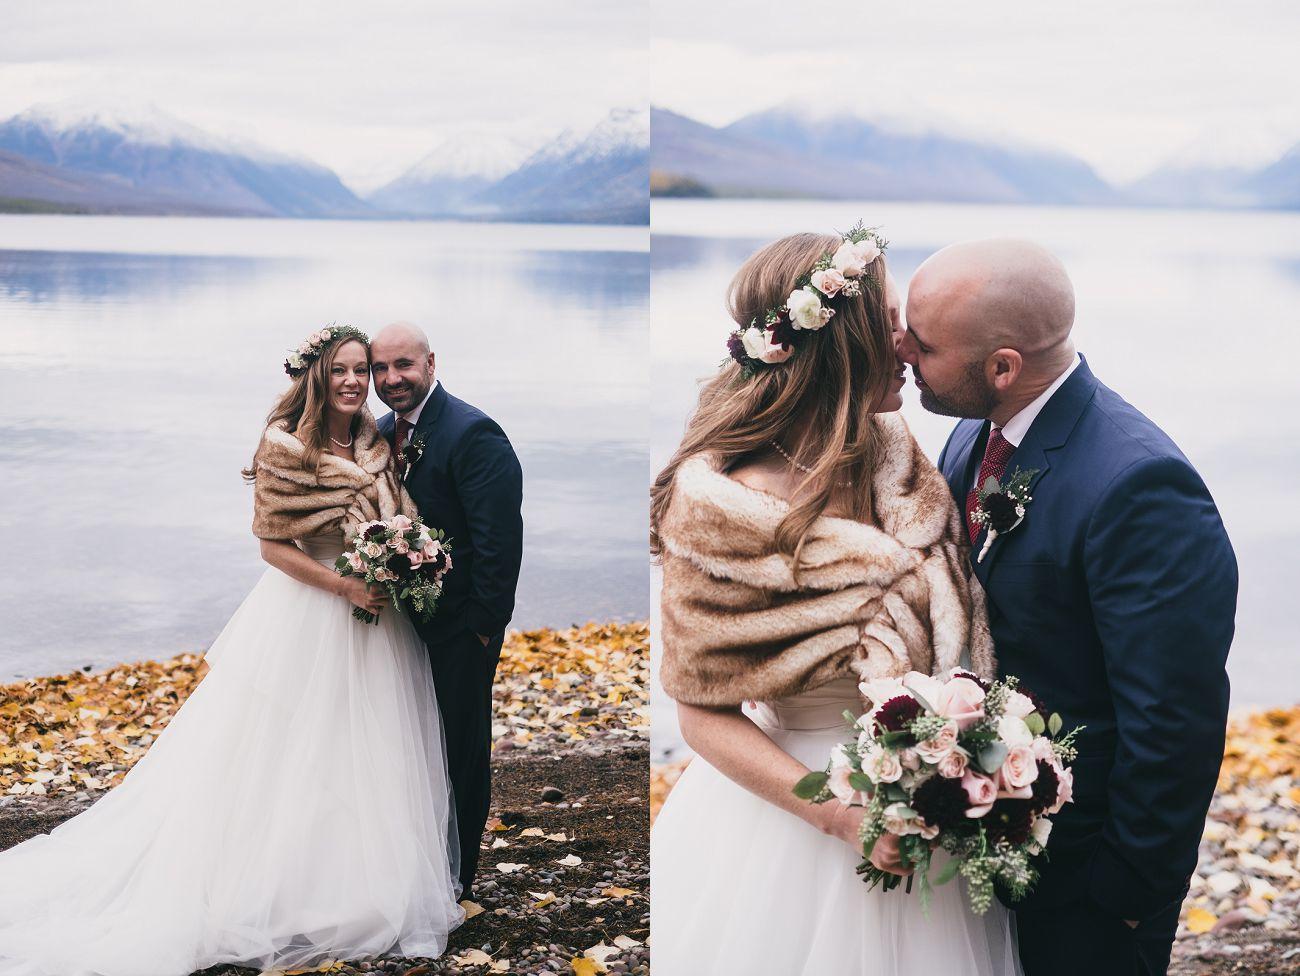 Jennifer_Mooney_Photo_Whitefish_mountain_resort_wedding_elegant_montana_wedding_071.jpg